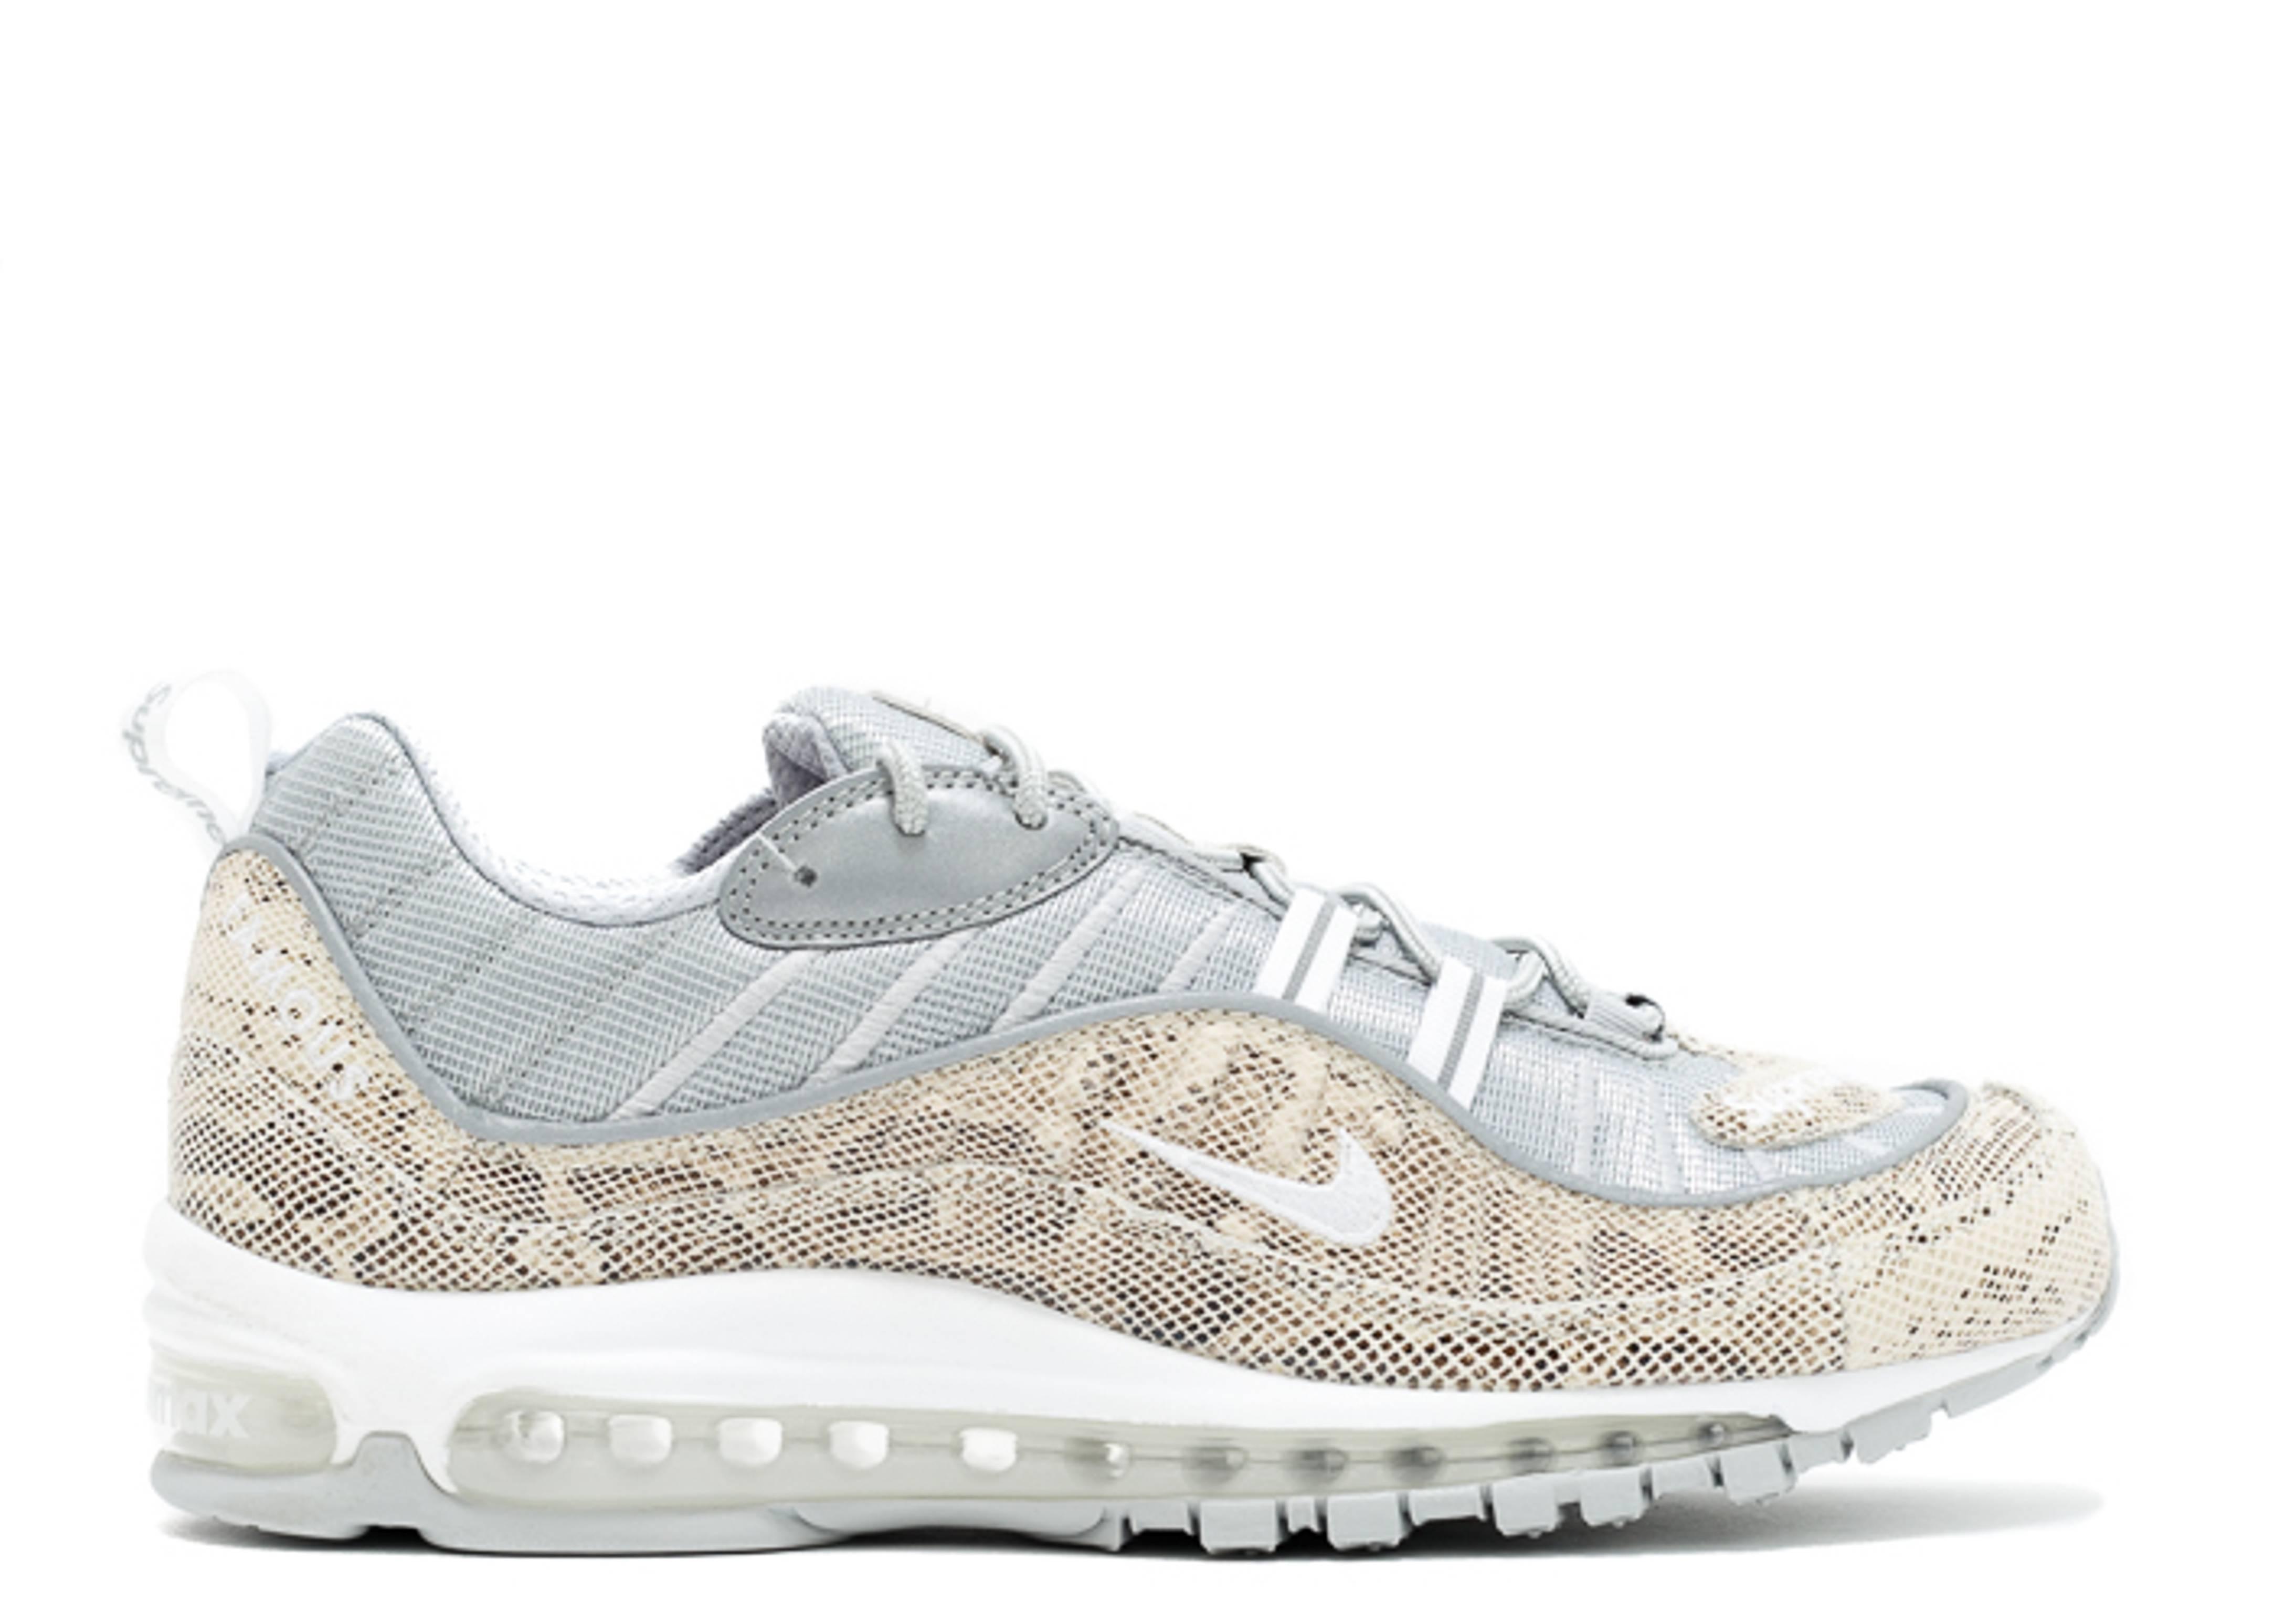 Supreme X Air Max 98 Snakeskin Nike 844694 100 Sail